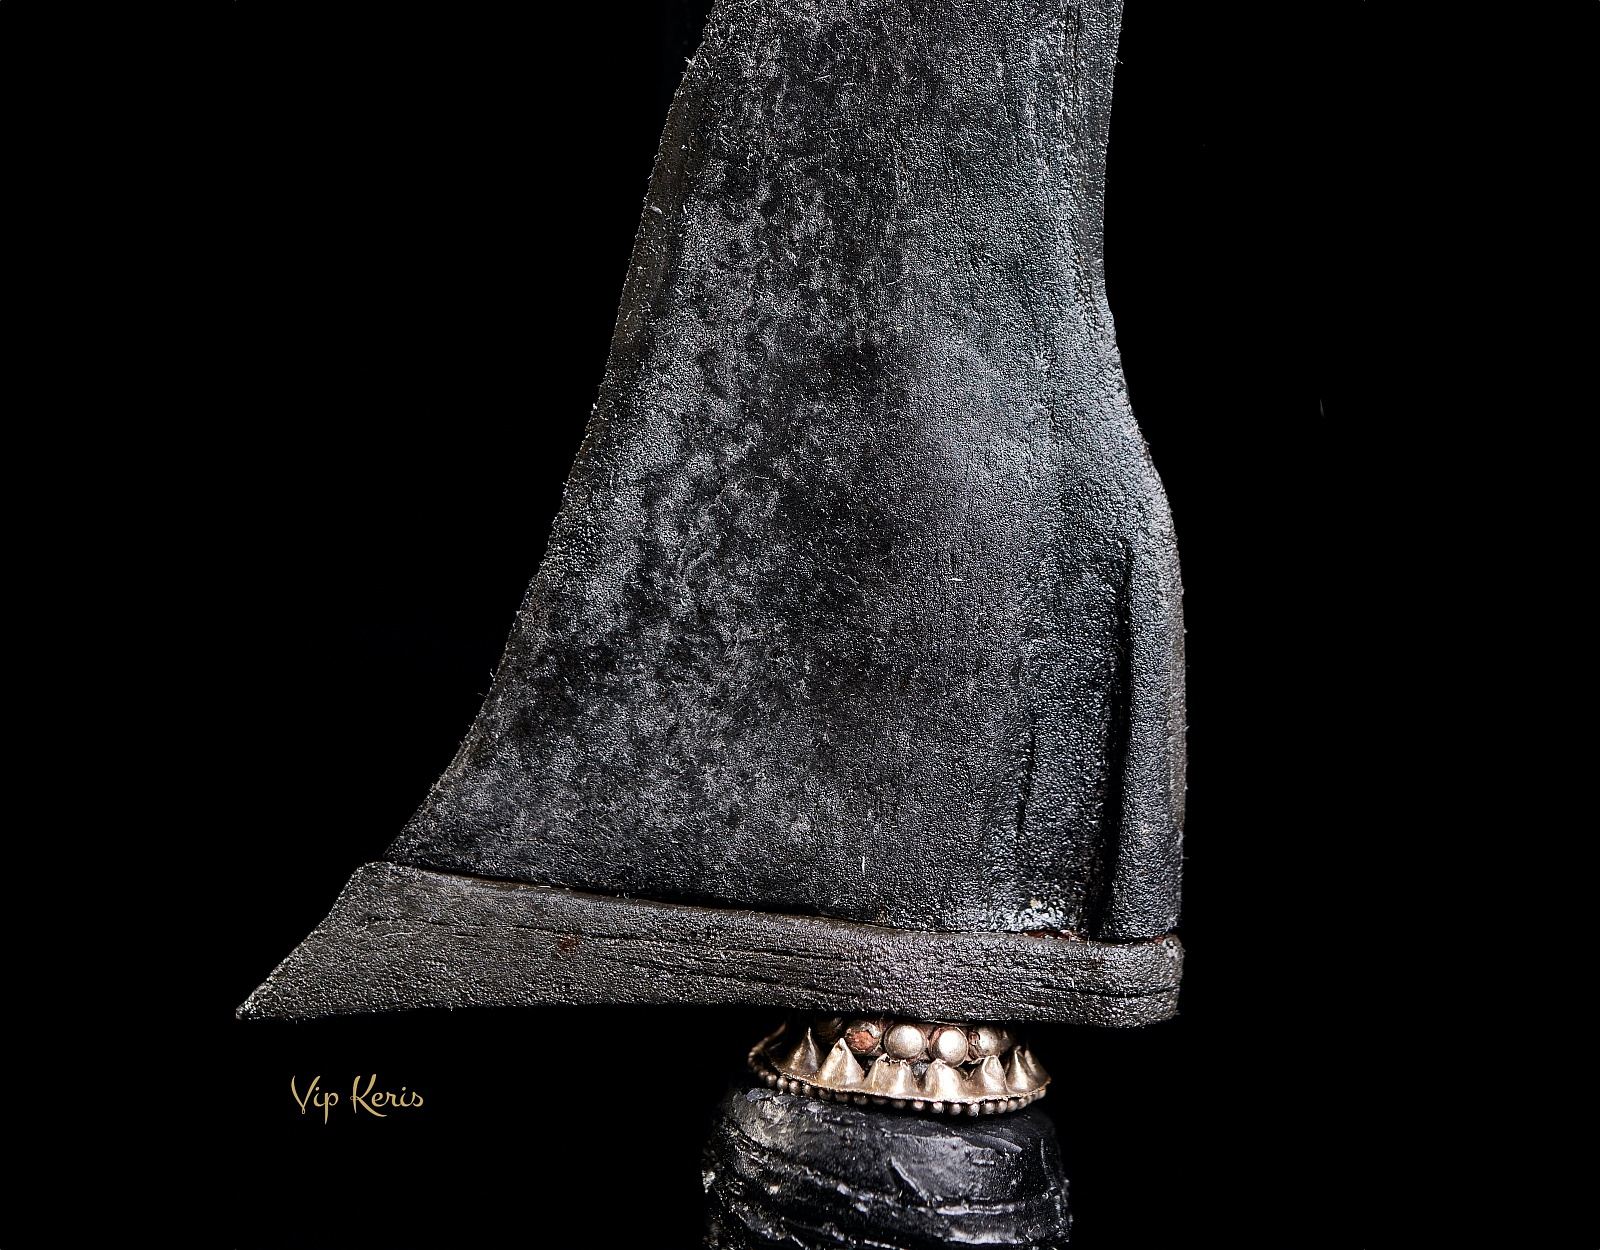 Кинжал Крис Bethok brojol, 5 аркан фото VipKeris